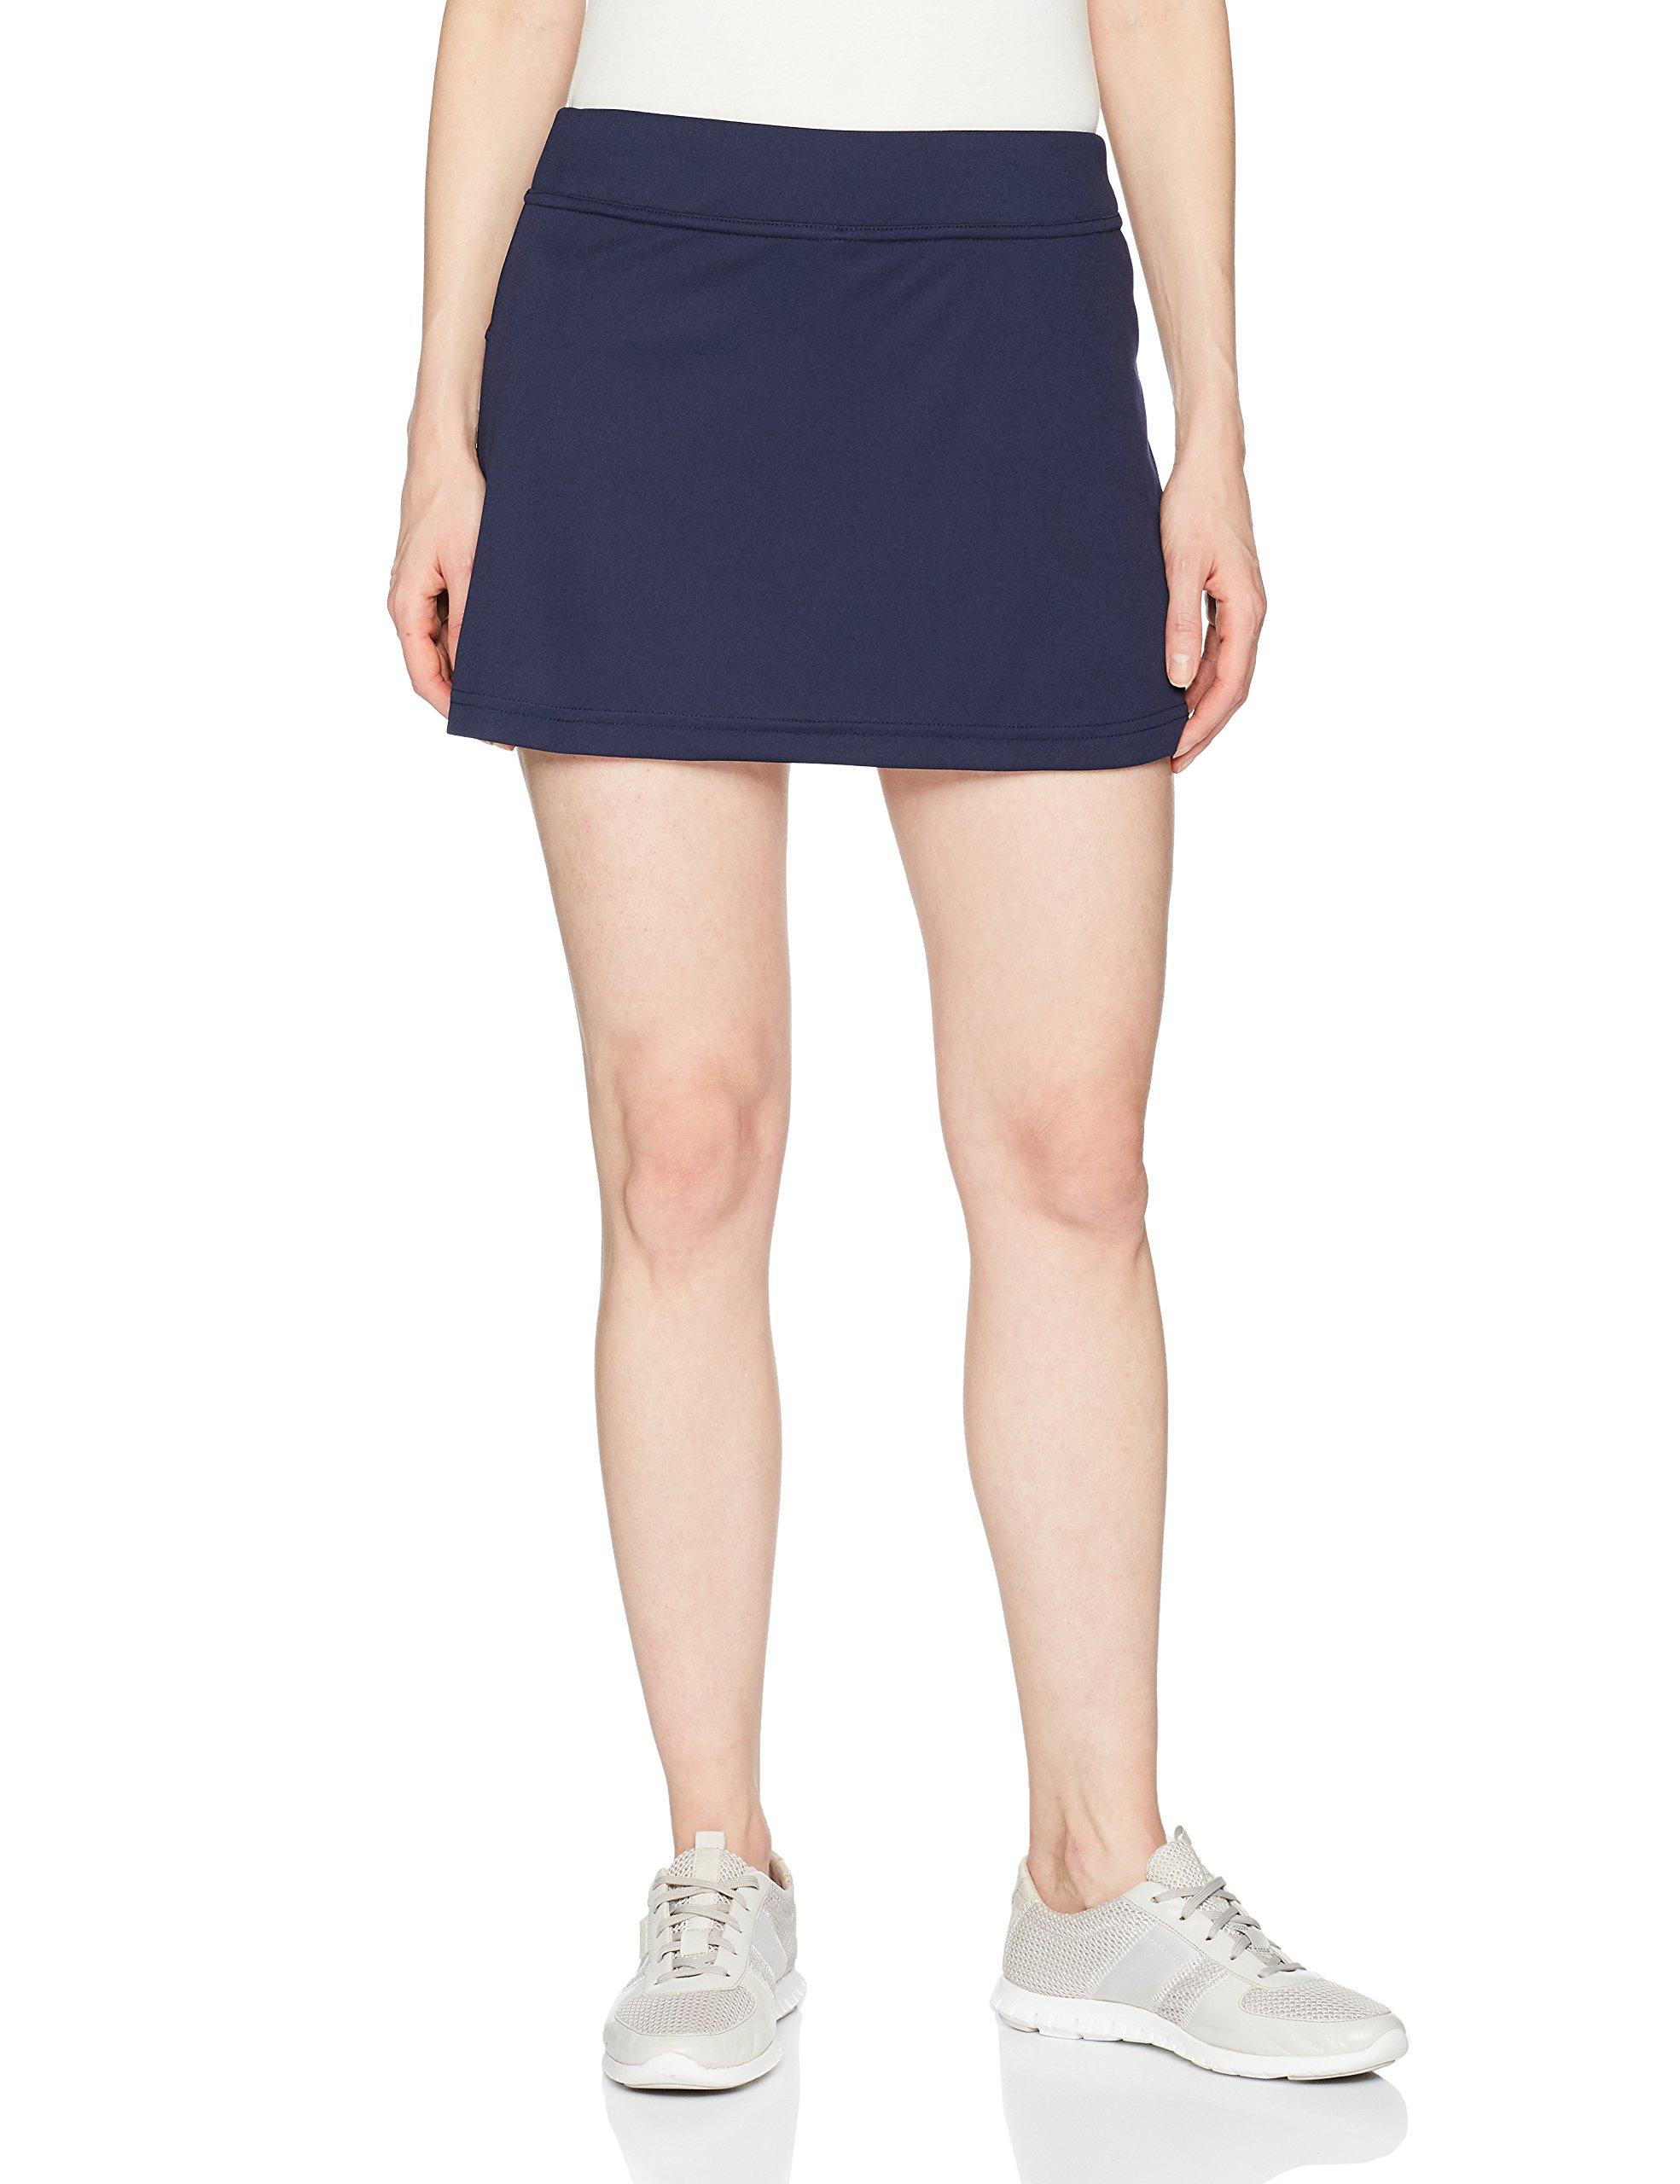 GRAND SLAM Tennis Women's Core 14'' Skorts with Back Pleats, Solid Peacoat, XL